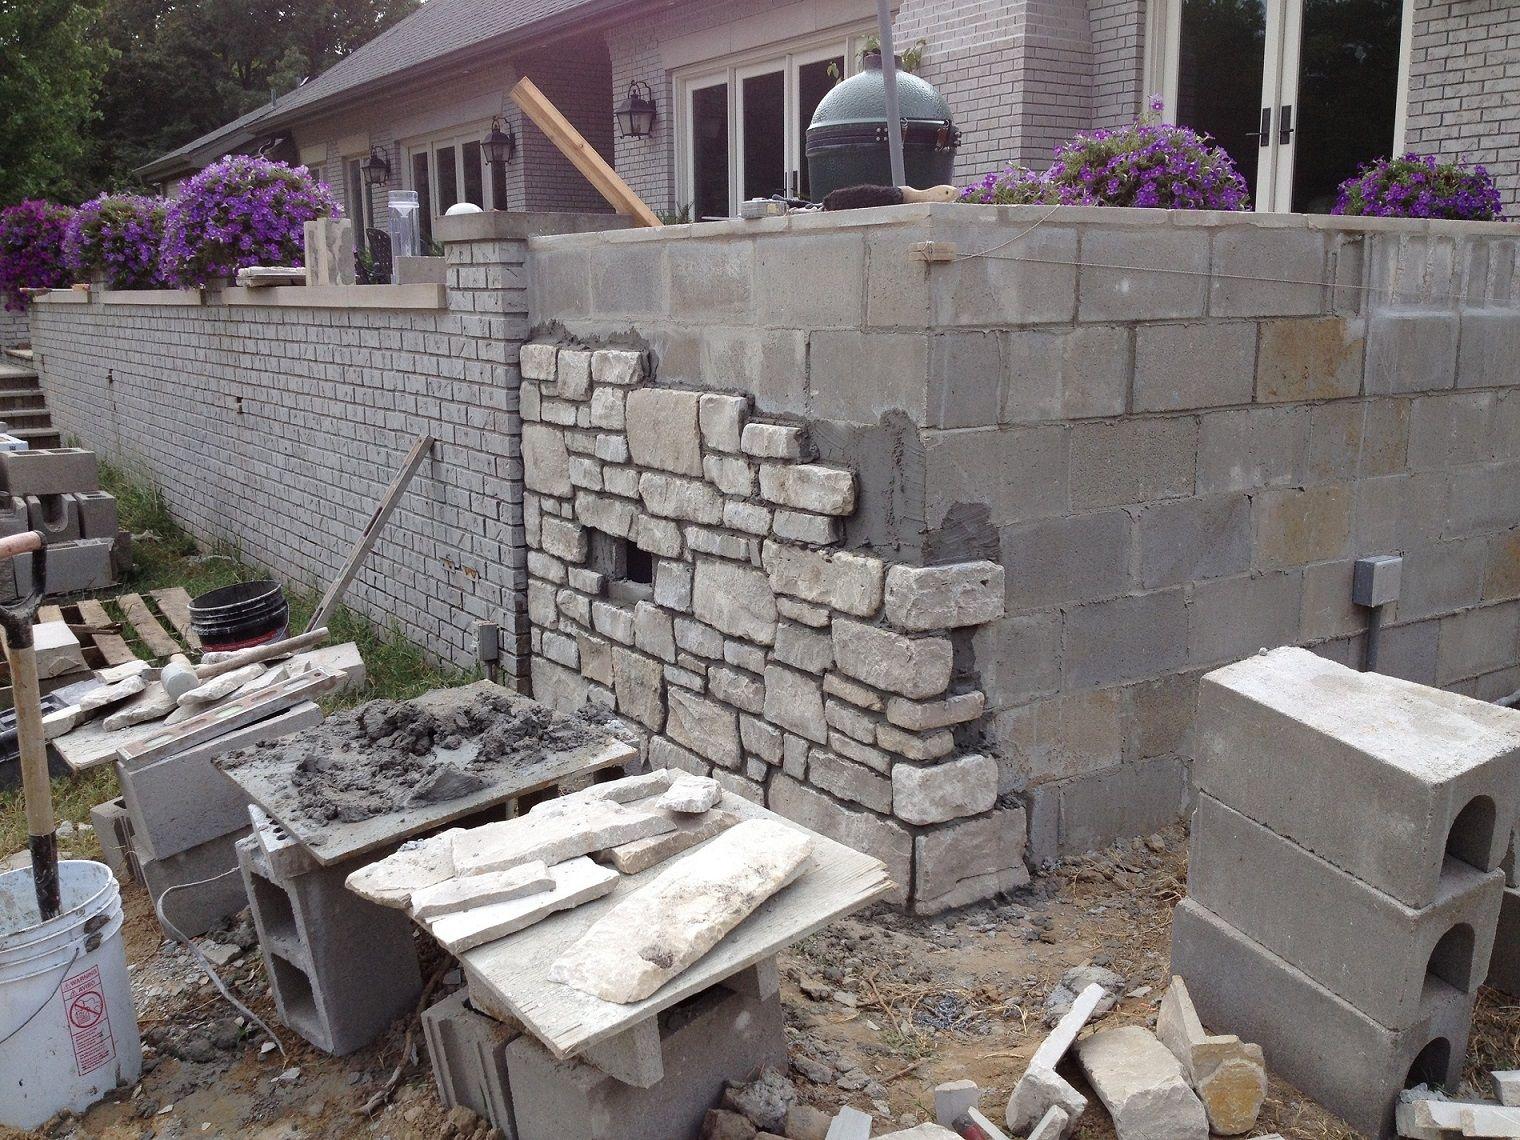 Outdoor Cinder Block Wall Decorating Ideas Cinder Block Walls Concrete Retaining Walls Concrete Block Walls